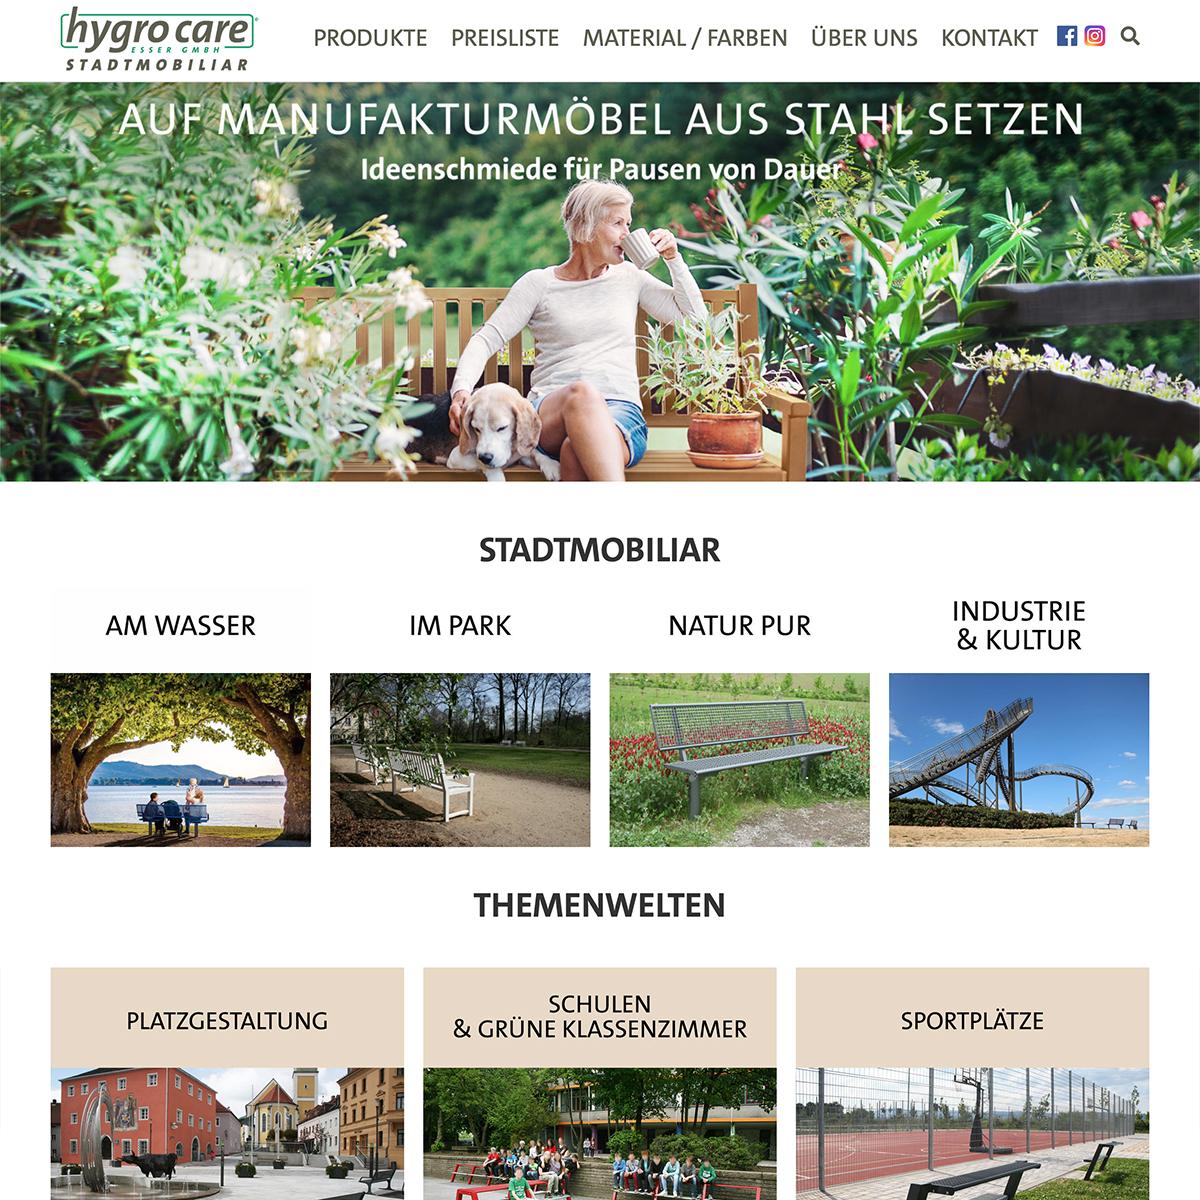 fd-work-website-hygro-care